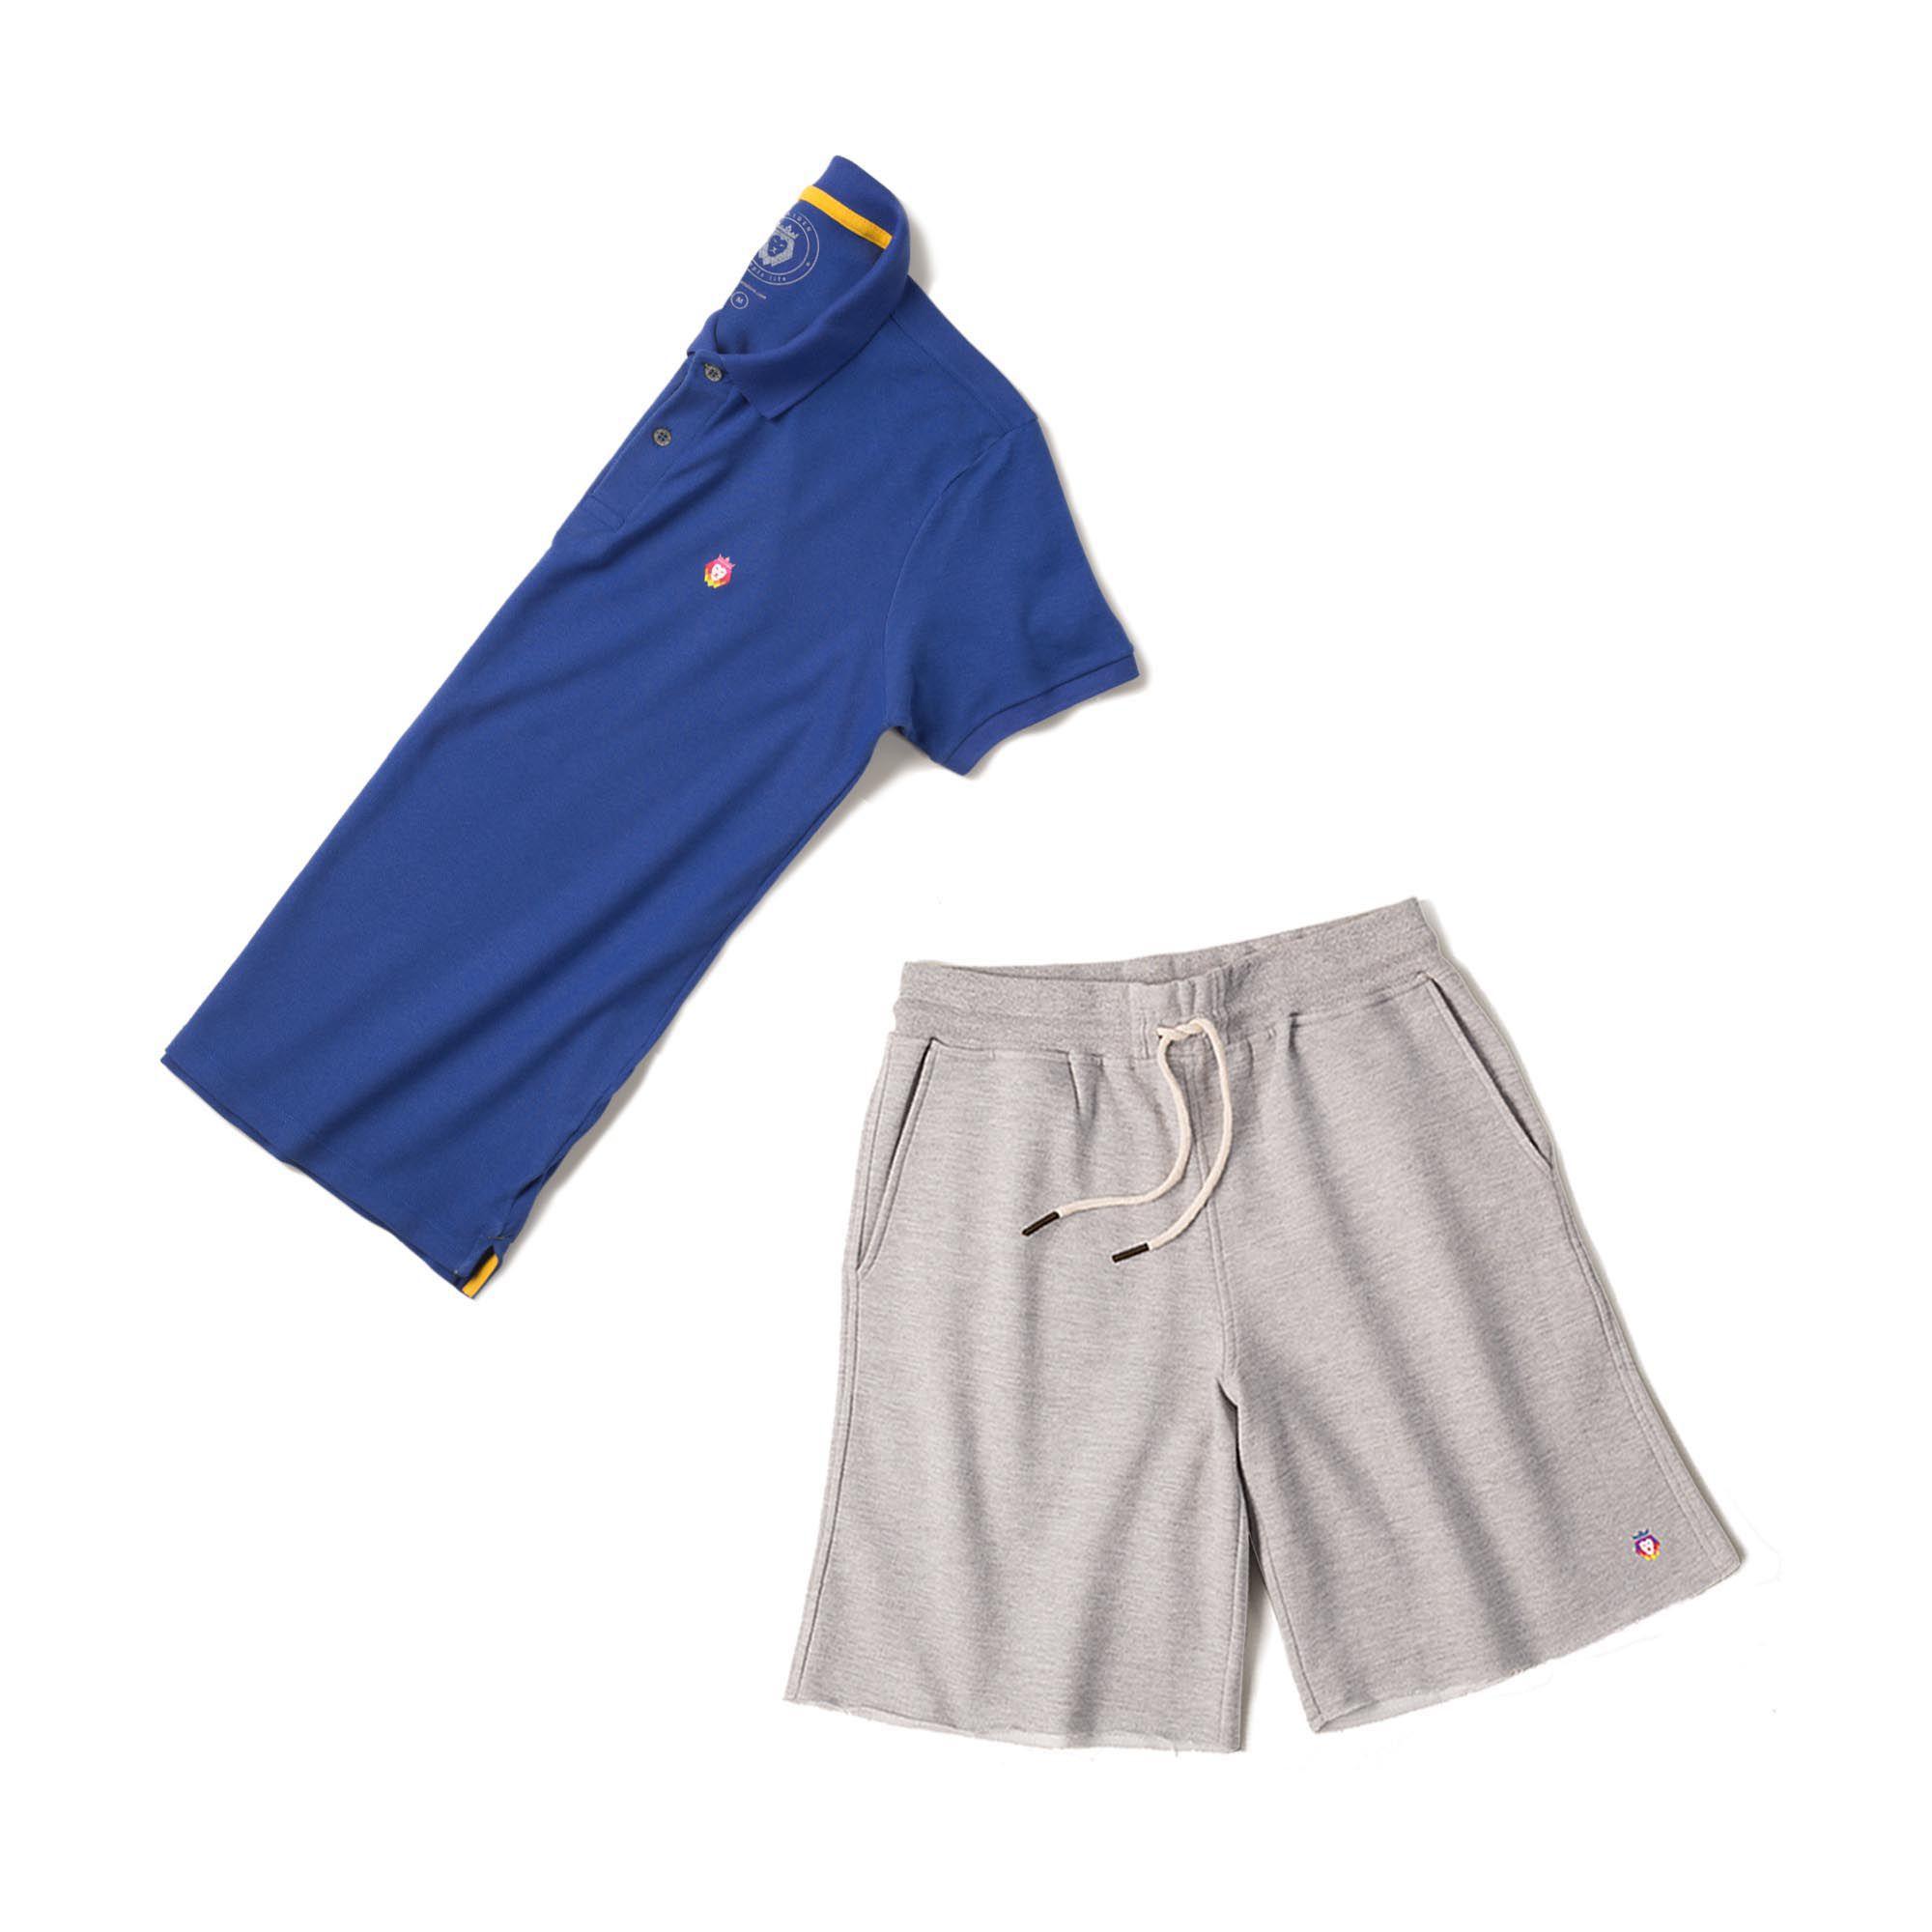 Kit 1 Bermuda Basic Mescla + 1 Camisa Polo Style Royal Zaiden Masculina